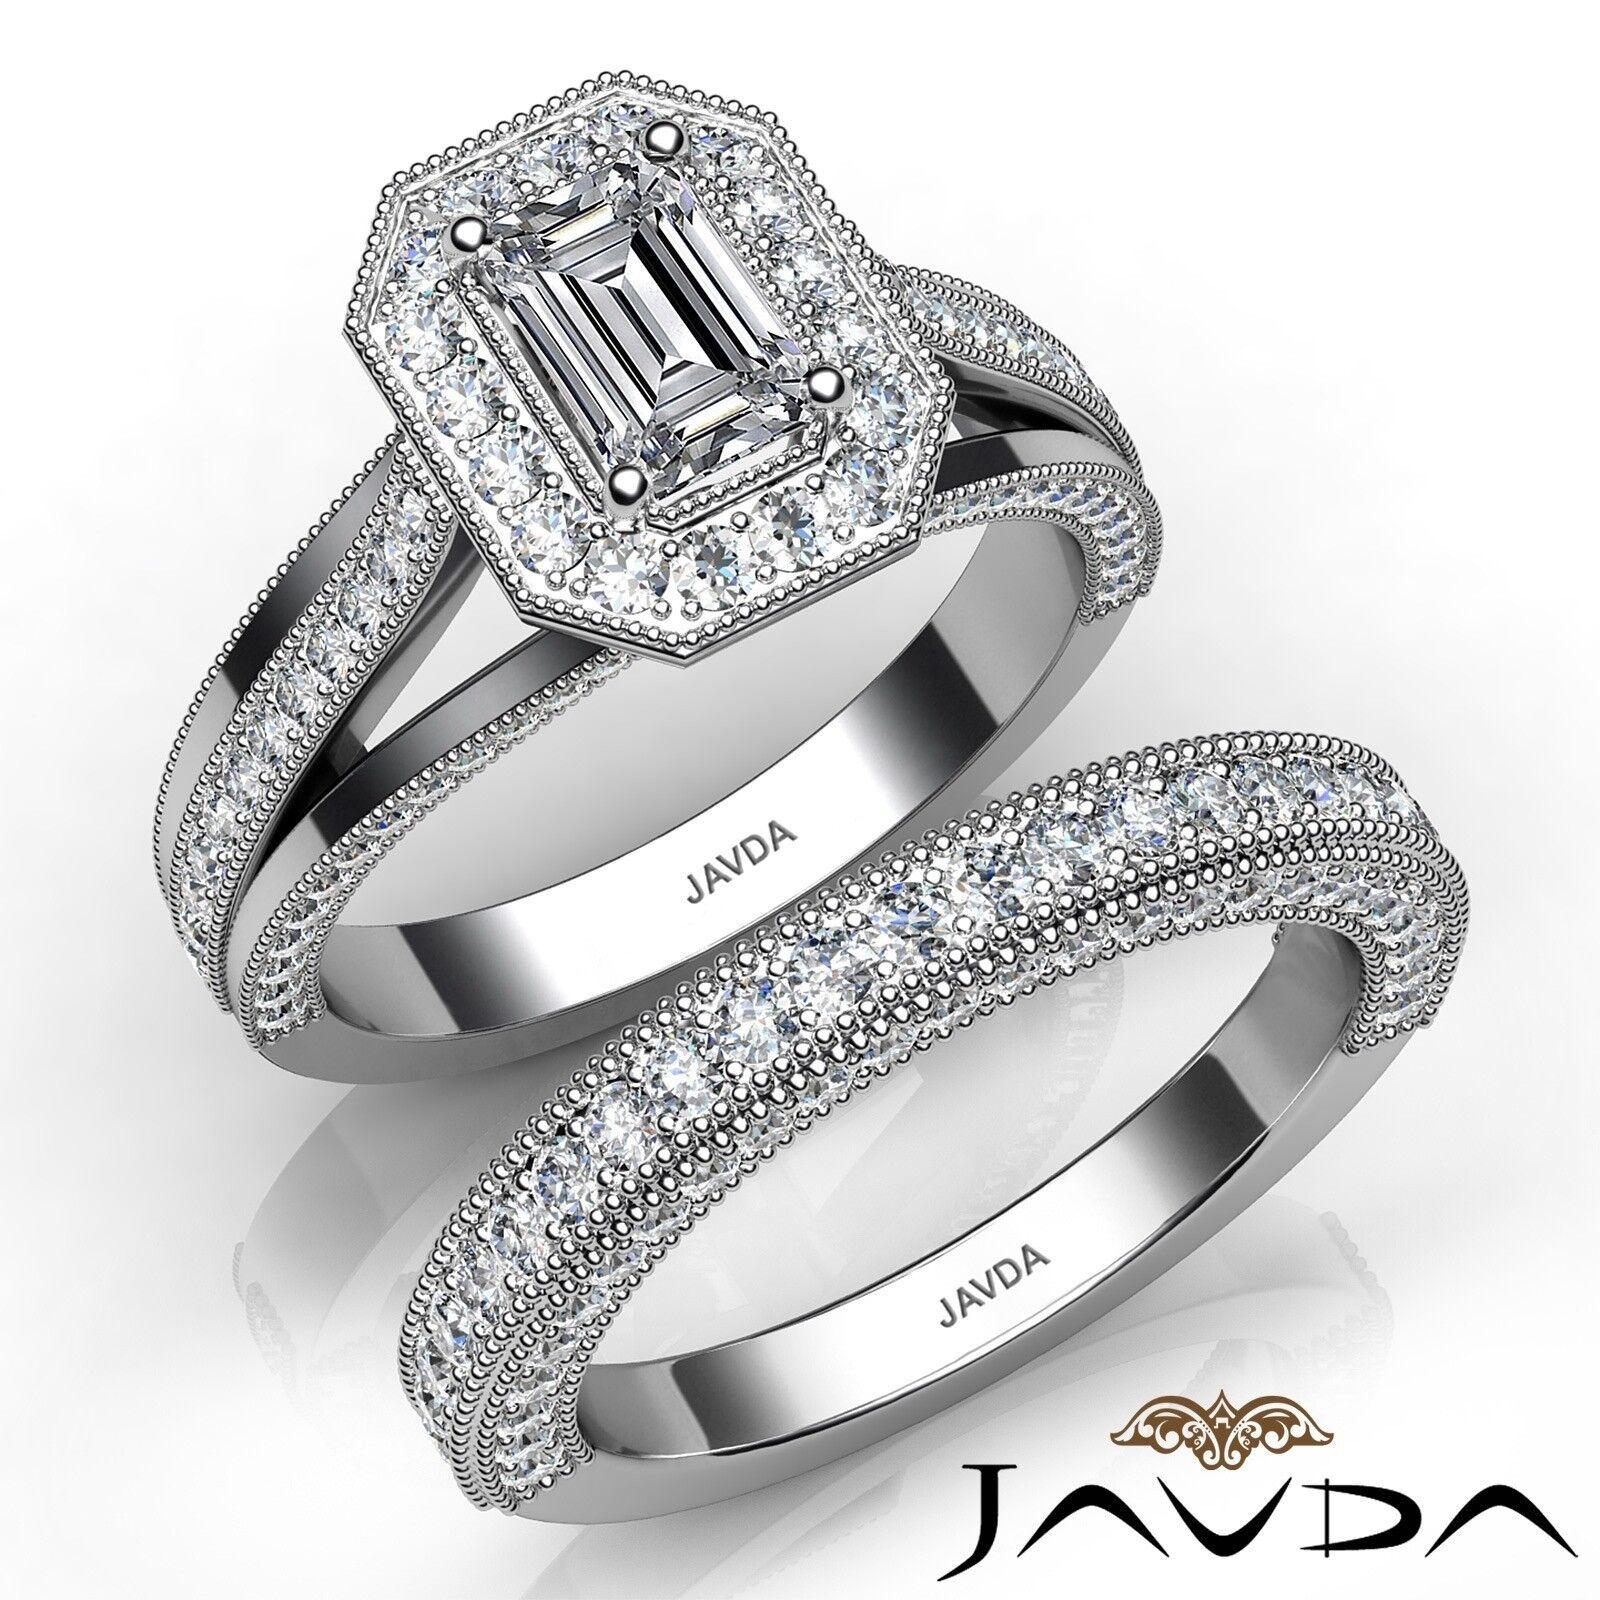 2.11ctw Milgrain Bridal Set Emerald Diamond Engagement Ring GIA E-VVS1 W Gold